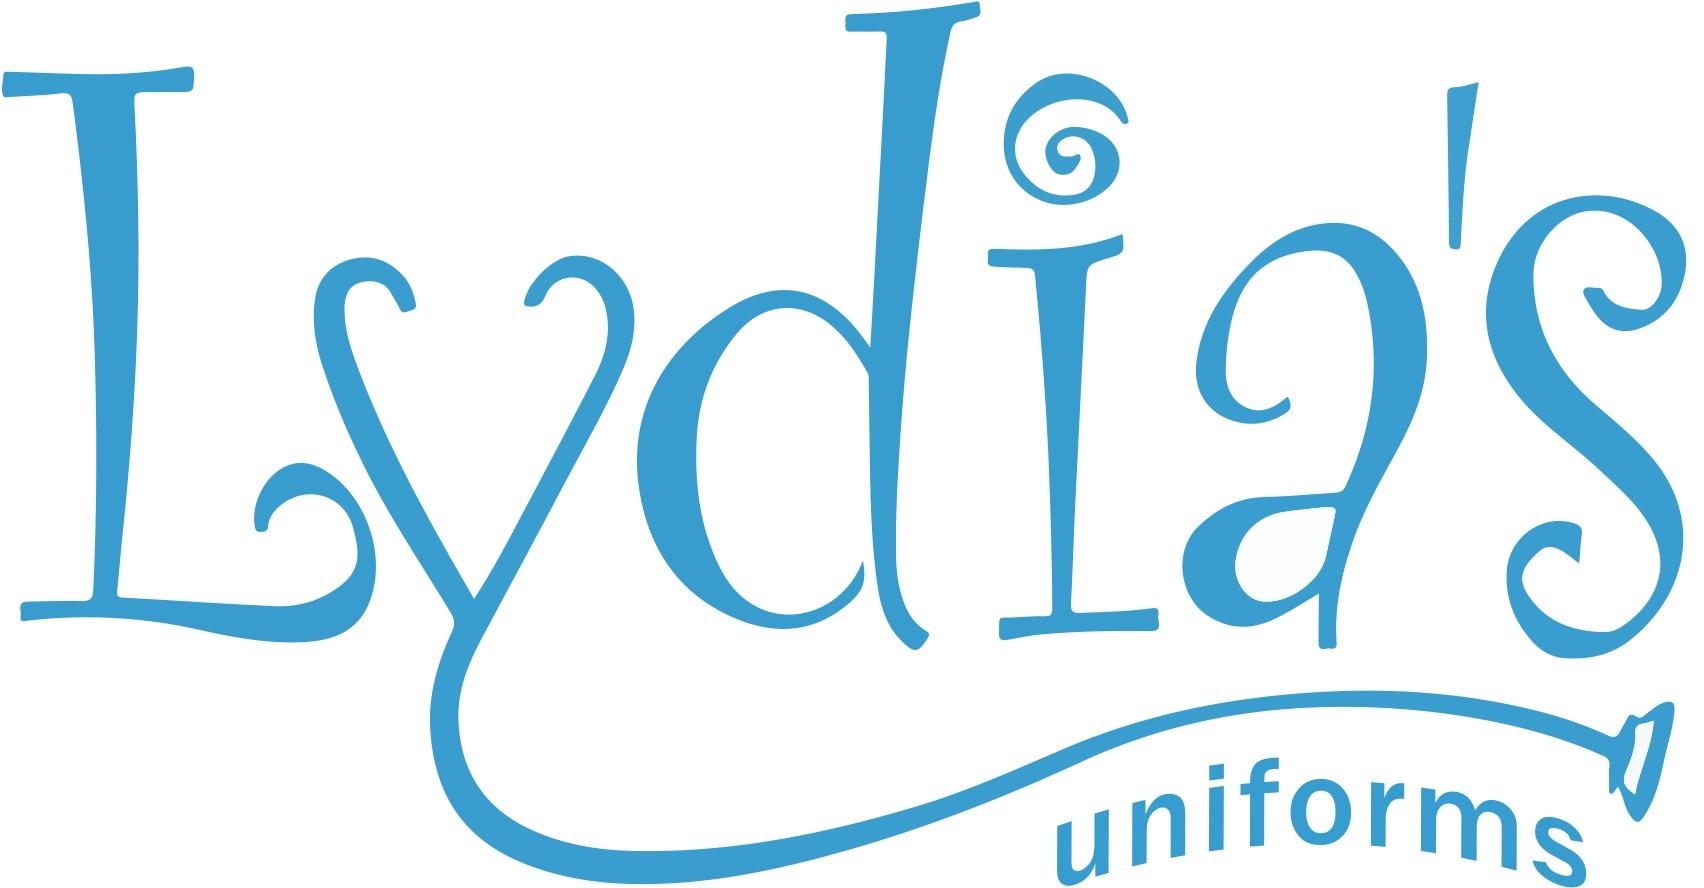 Lydia's Uniforms: www.lydiasuniforms.com